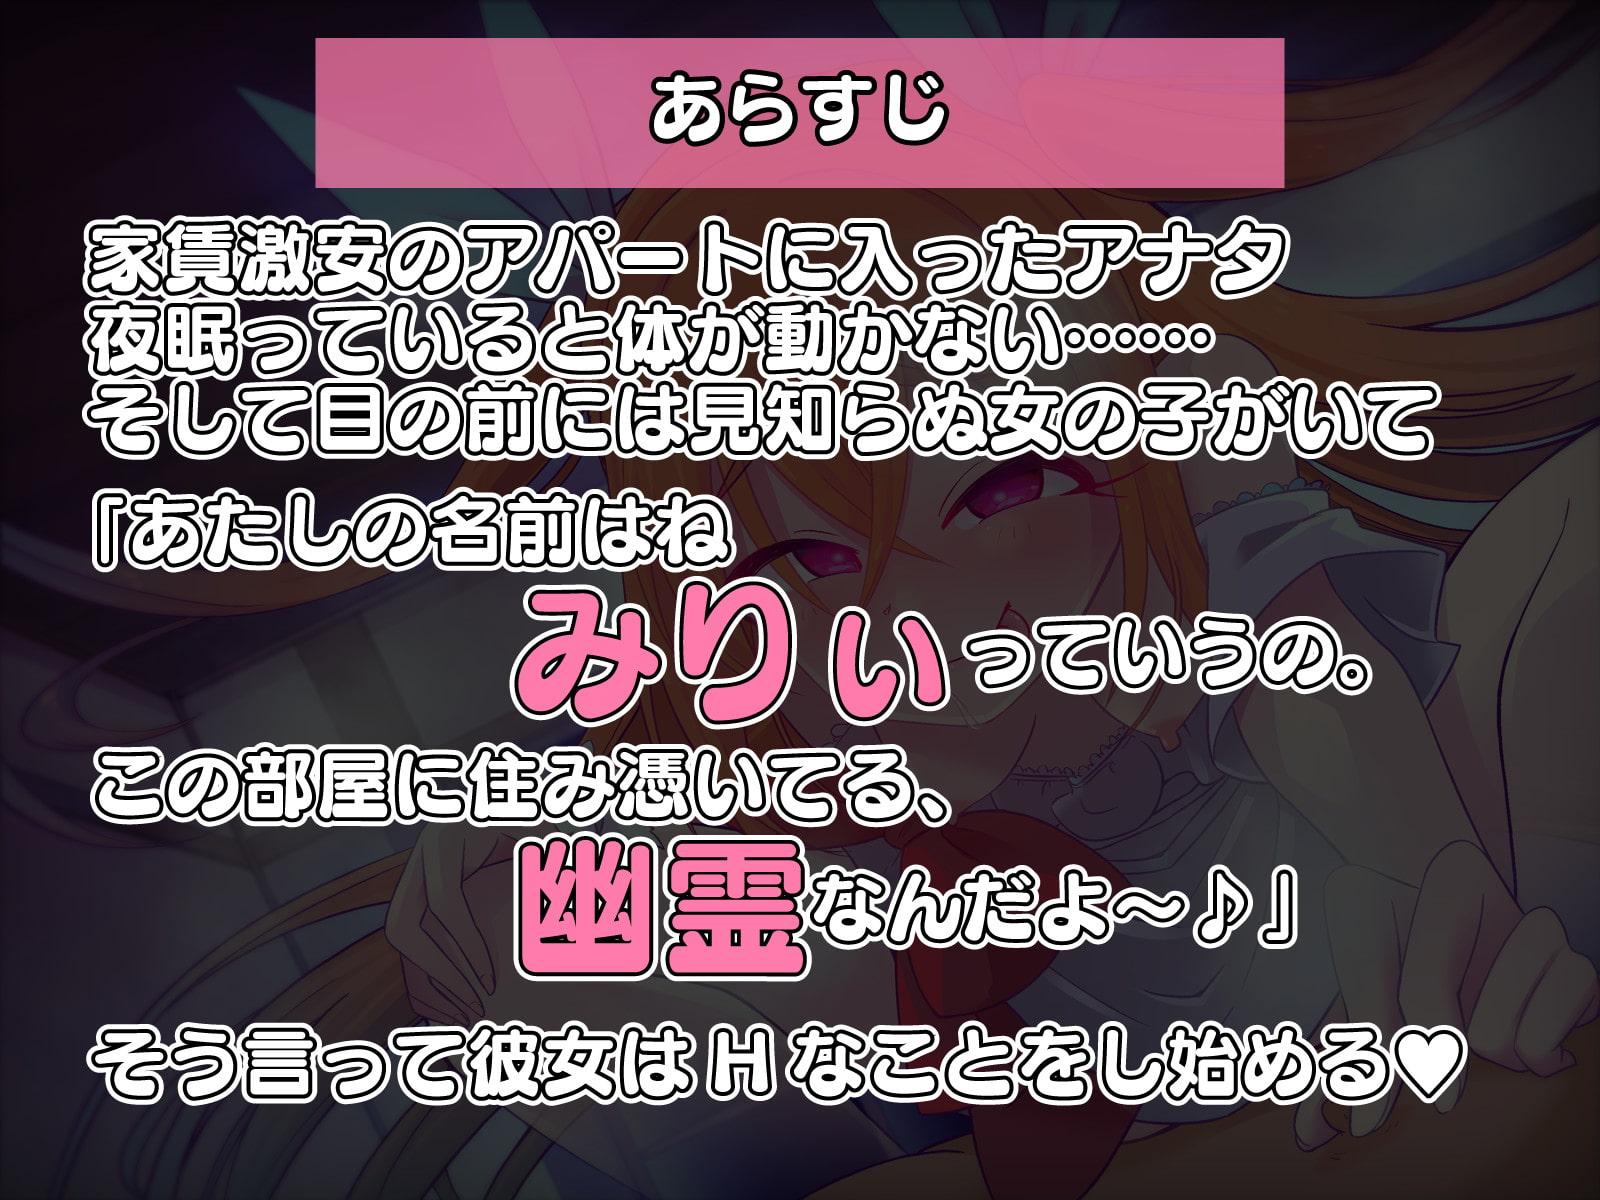 【KU100】メスガキ幽霊が部屋に棲み着いていた件【バイノーラル】 [道々亭]